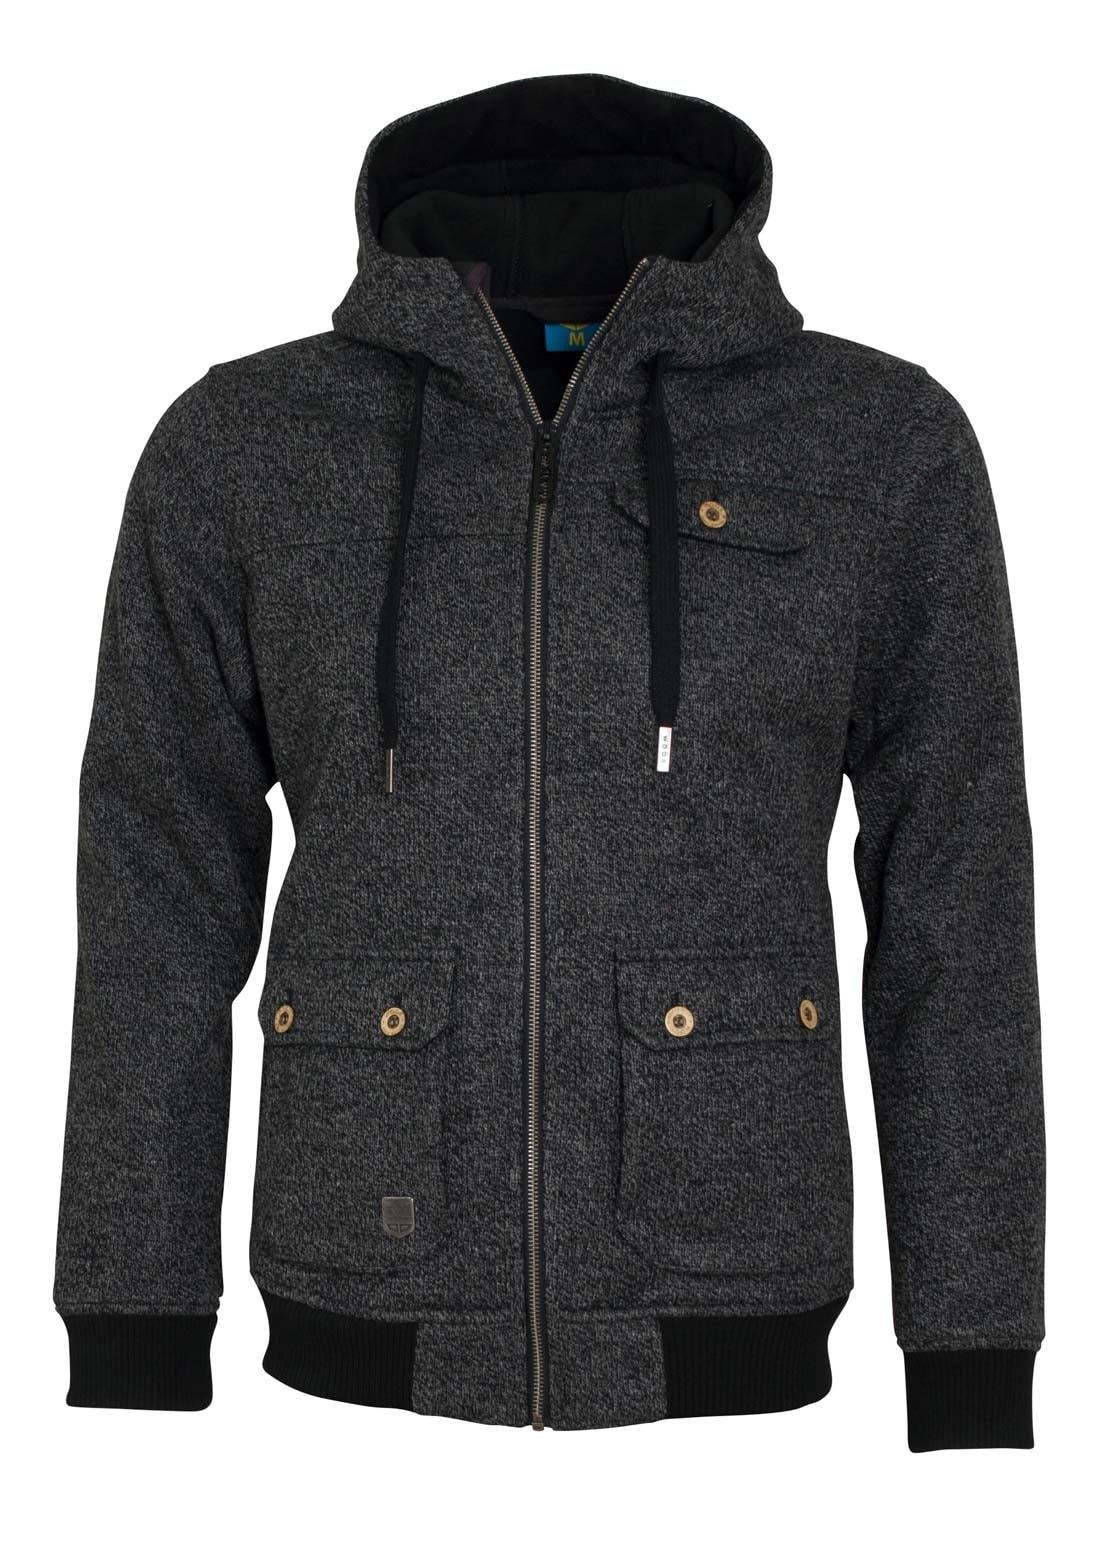 Bunda pánska Woox Woolshell Men's Jacket